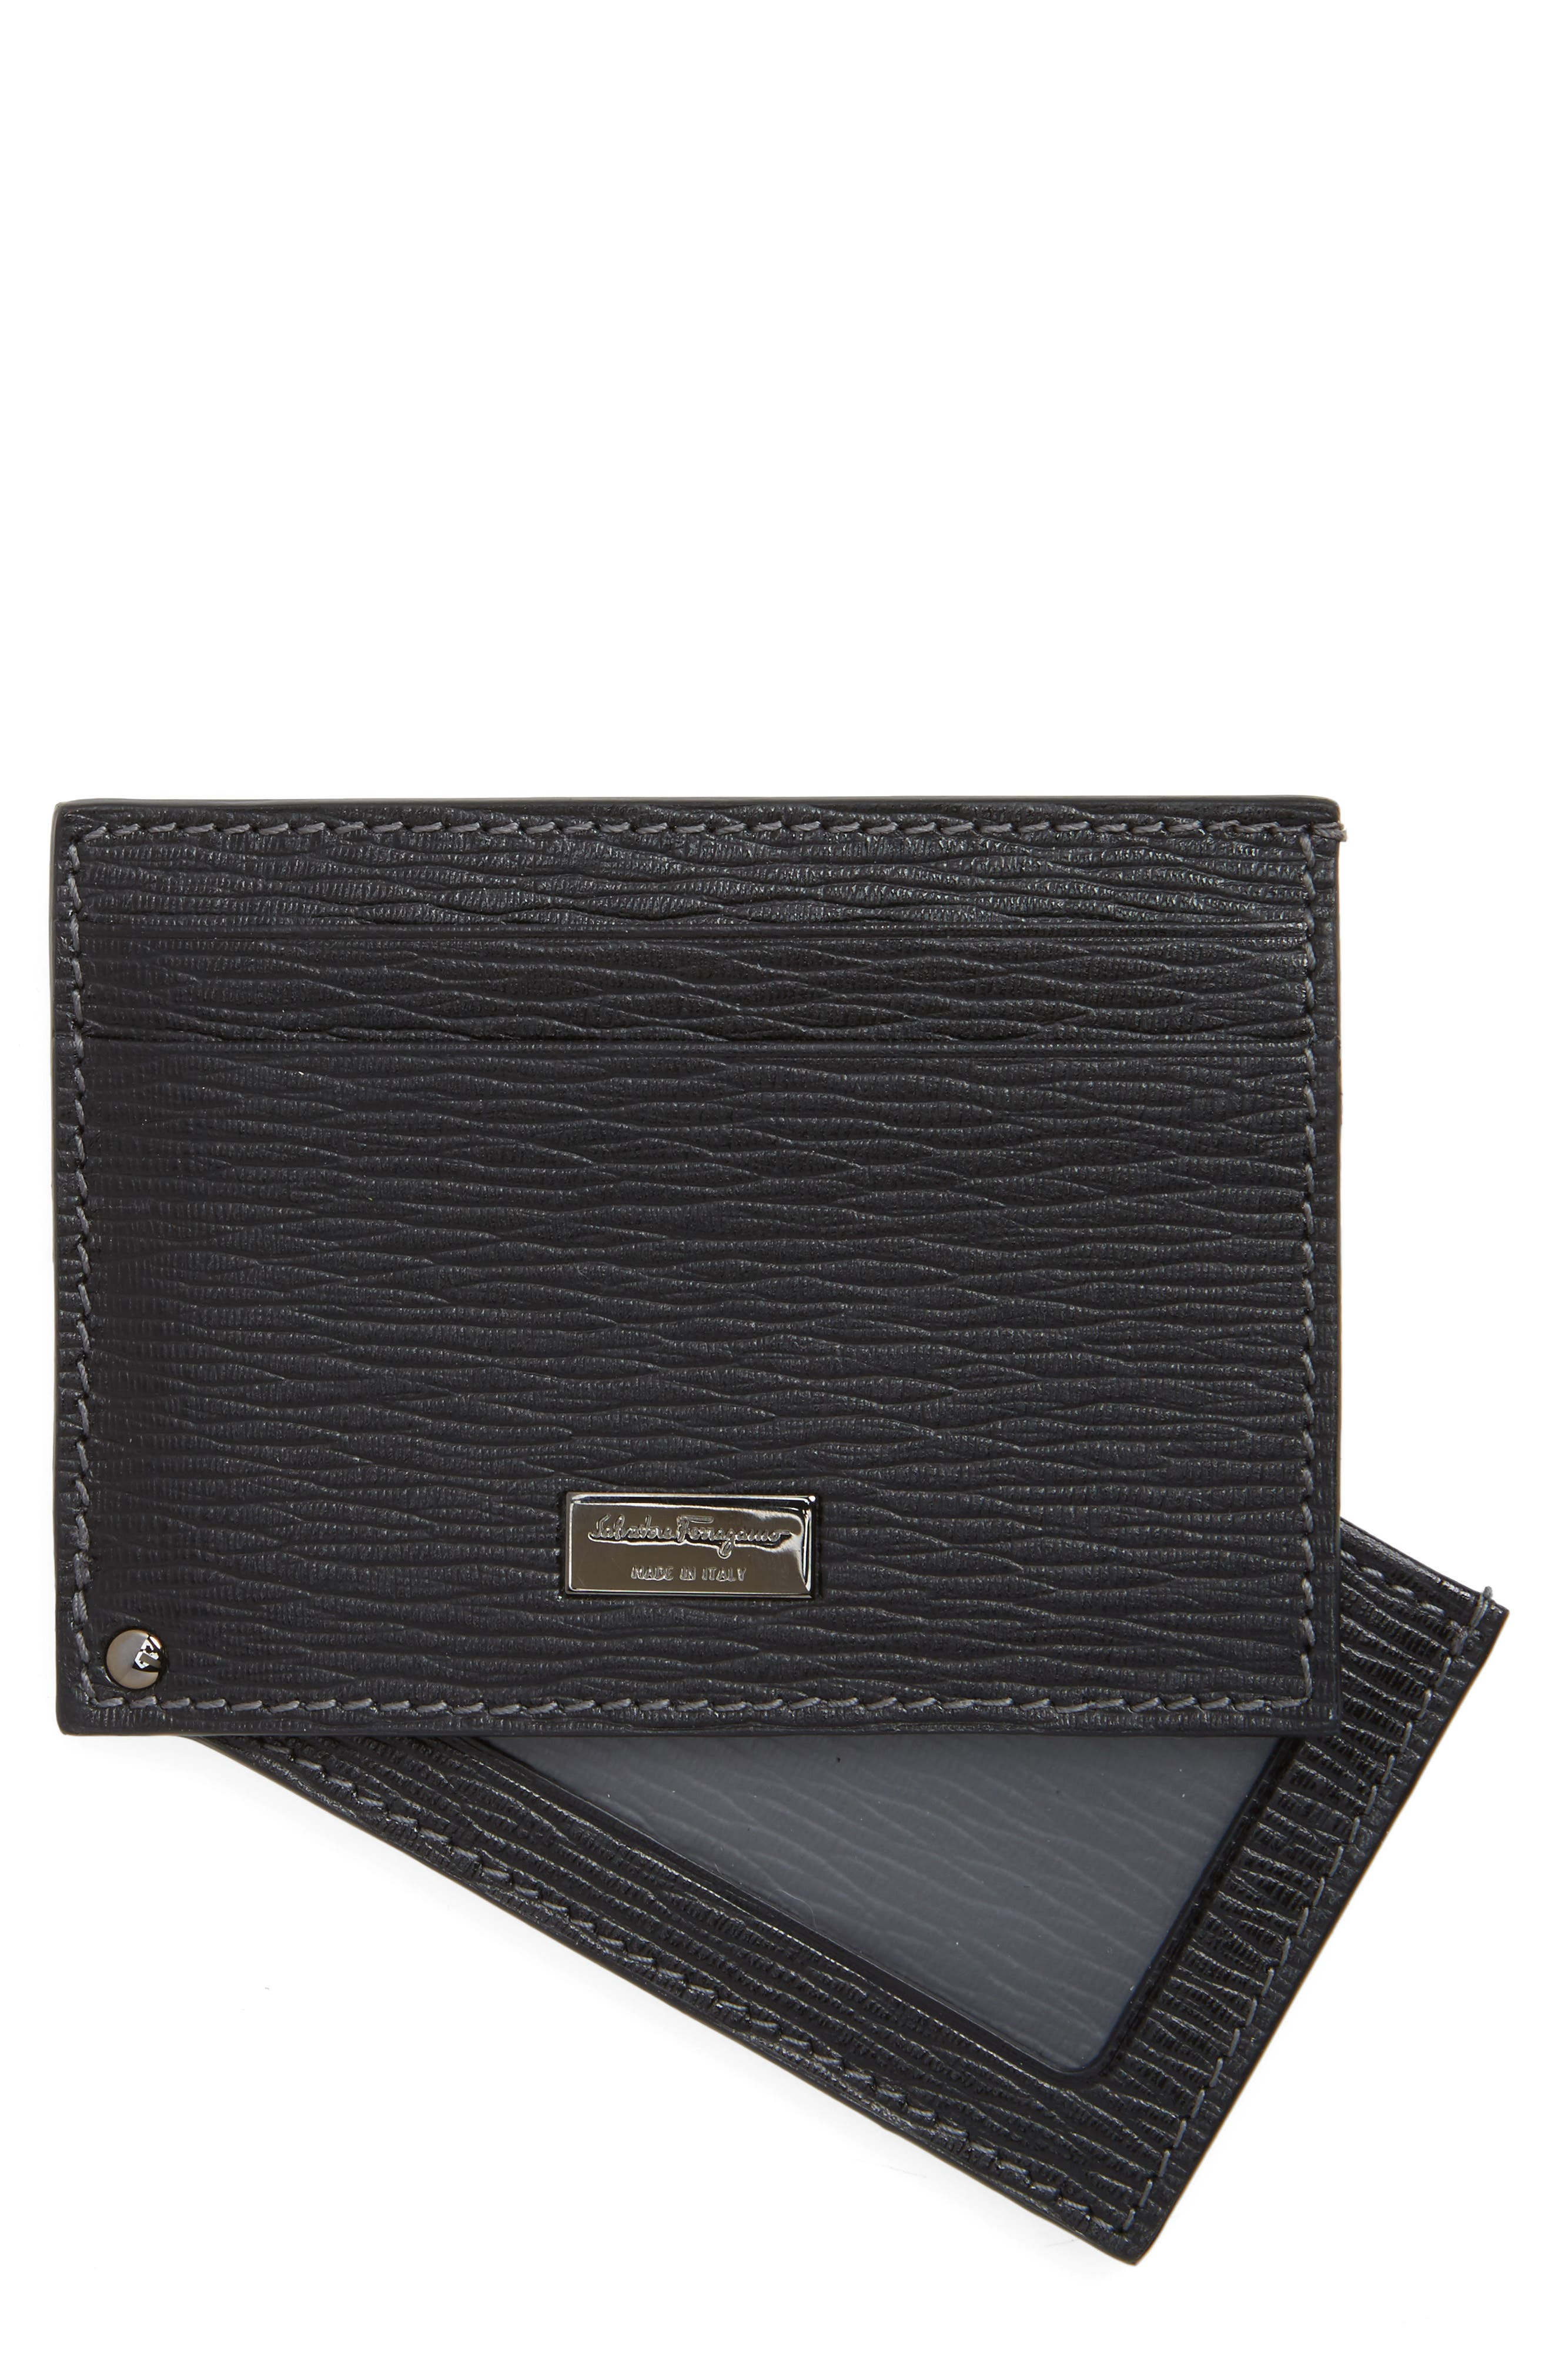 Salvatore Ferragamo Leather Card Case